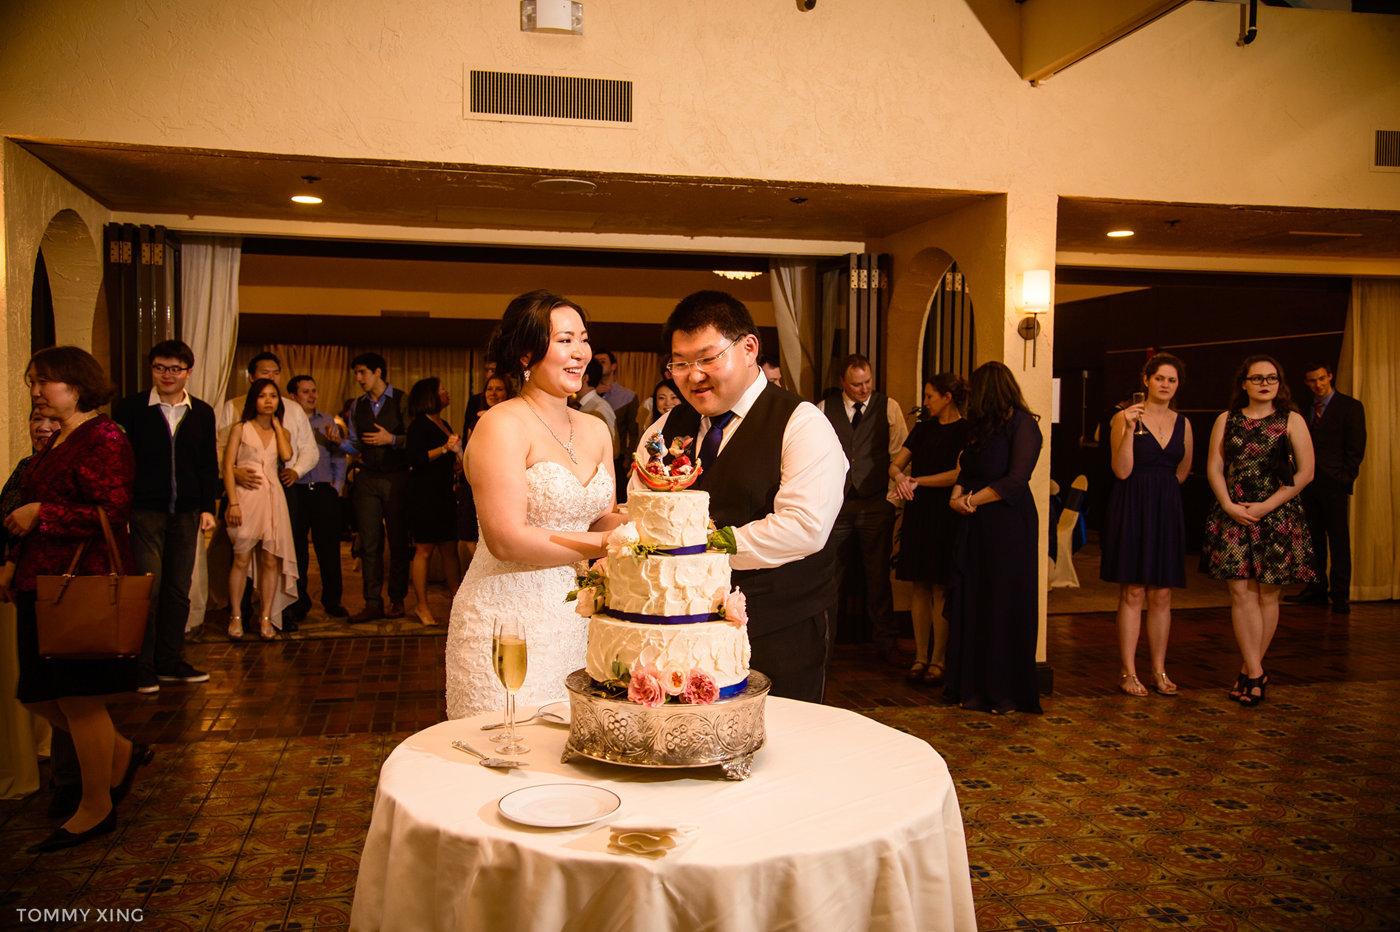 STANFORD MEMORIAL CHURCH WEDDING - Wenjie & Chengcheng - SAN FRANCISCO BAY AREA 斯坦福教堂婚礼跟拍 - 洛杉矶婚礼婚纱照摄影师 Tommy Xing Photography234.jpg